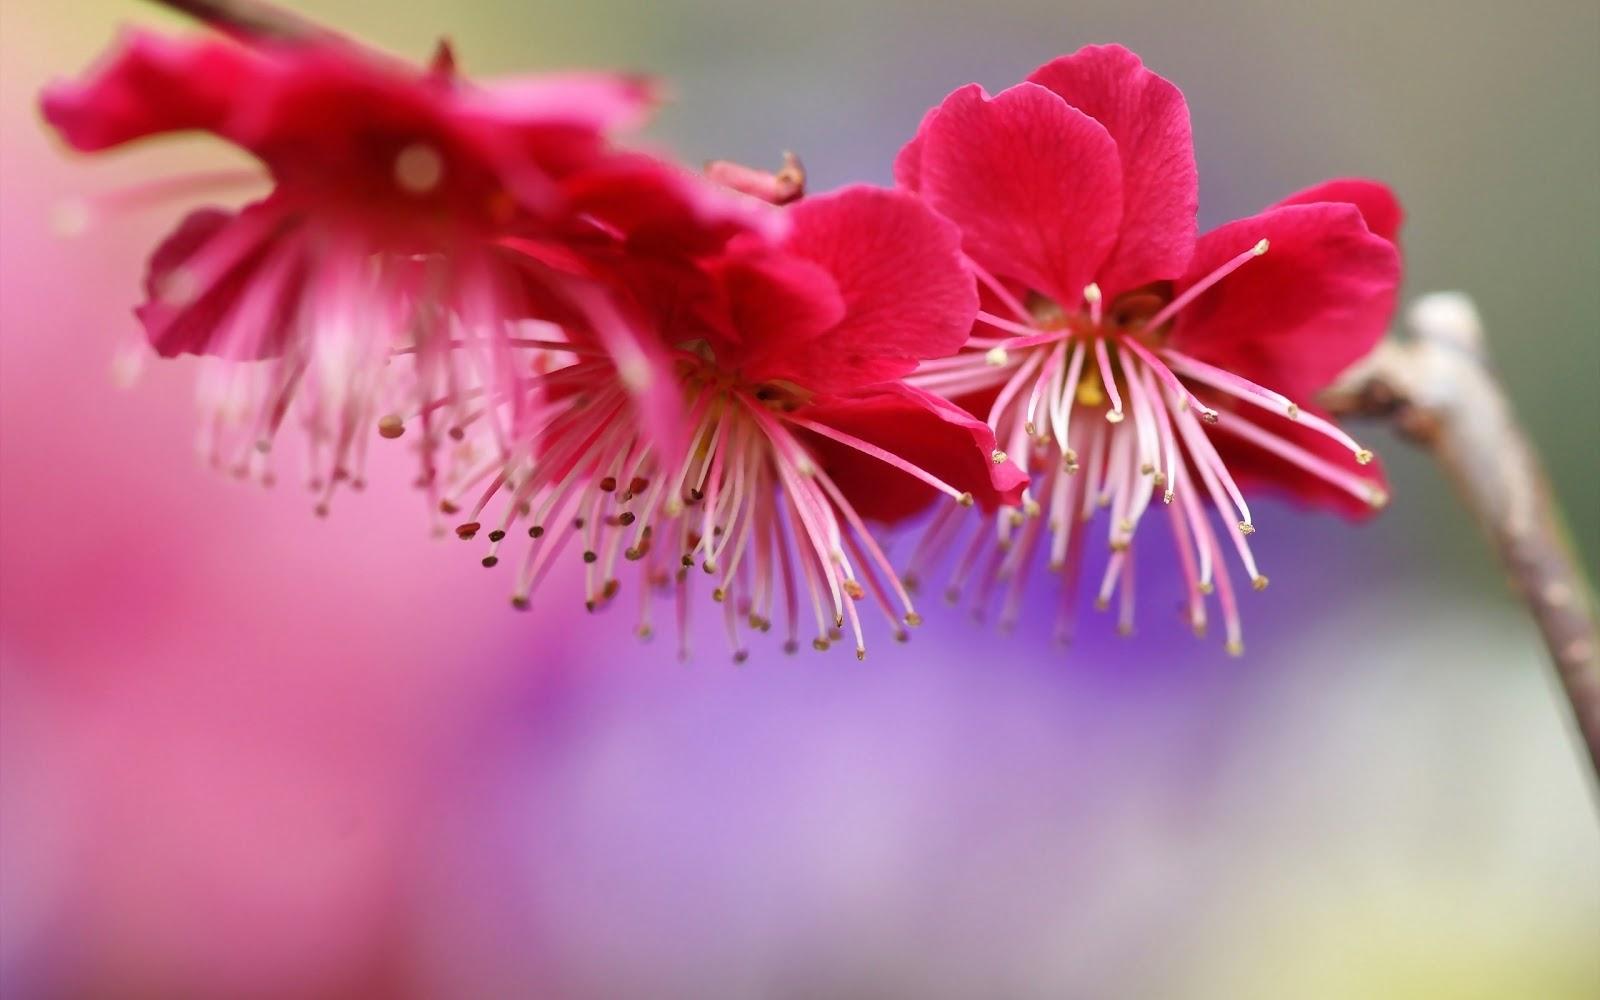 spring flower wallpaper pink - photo #18